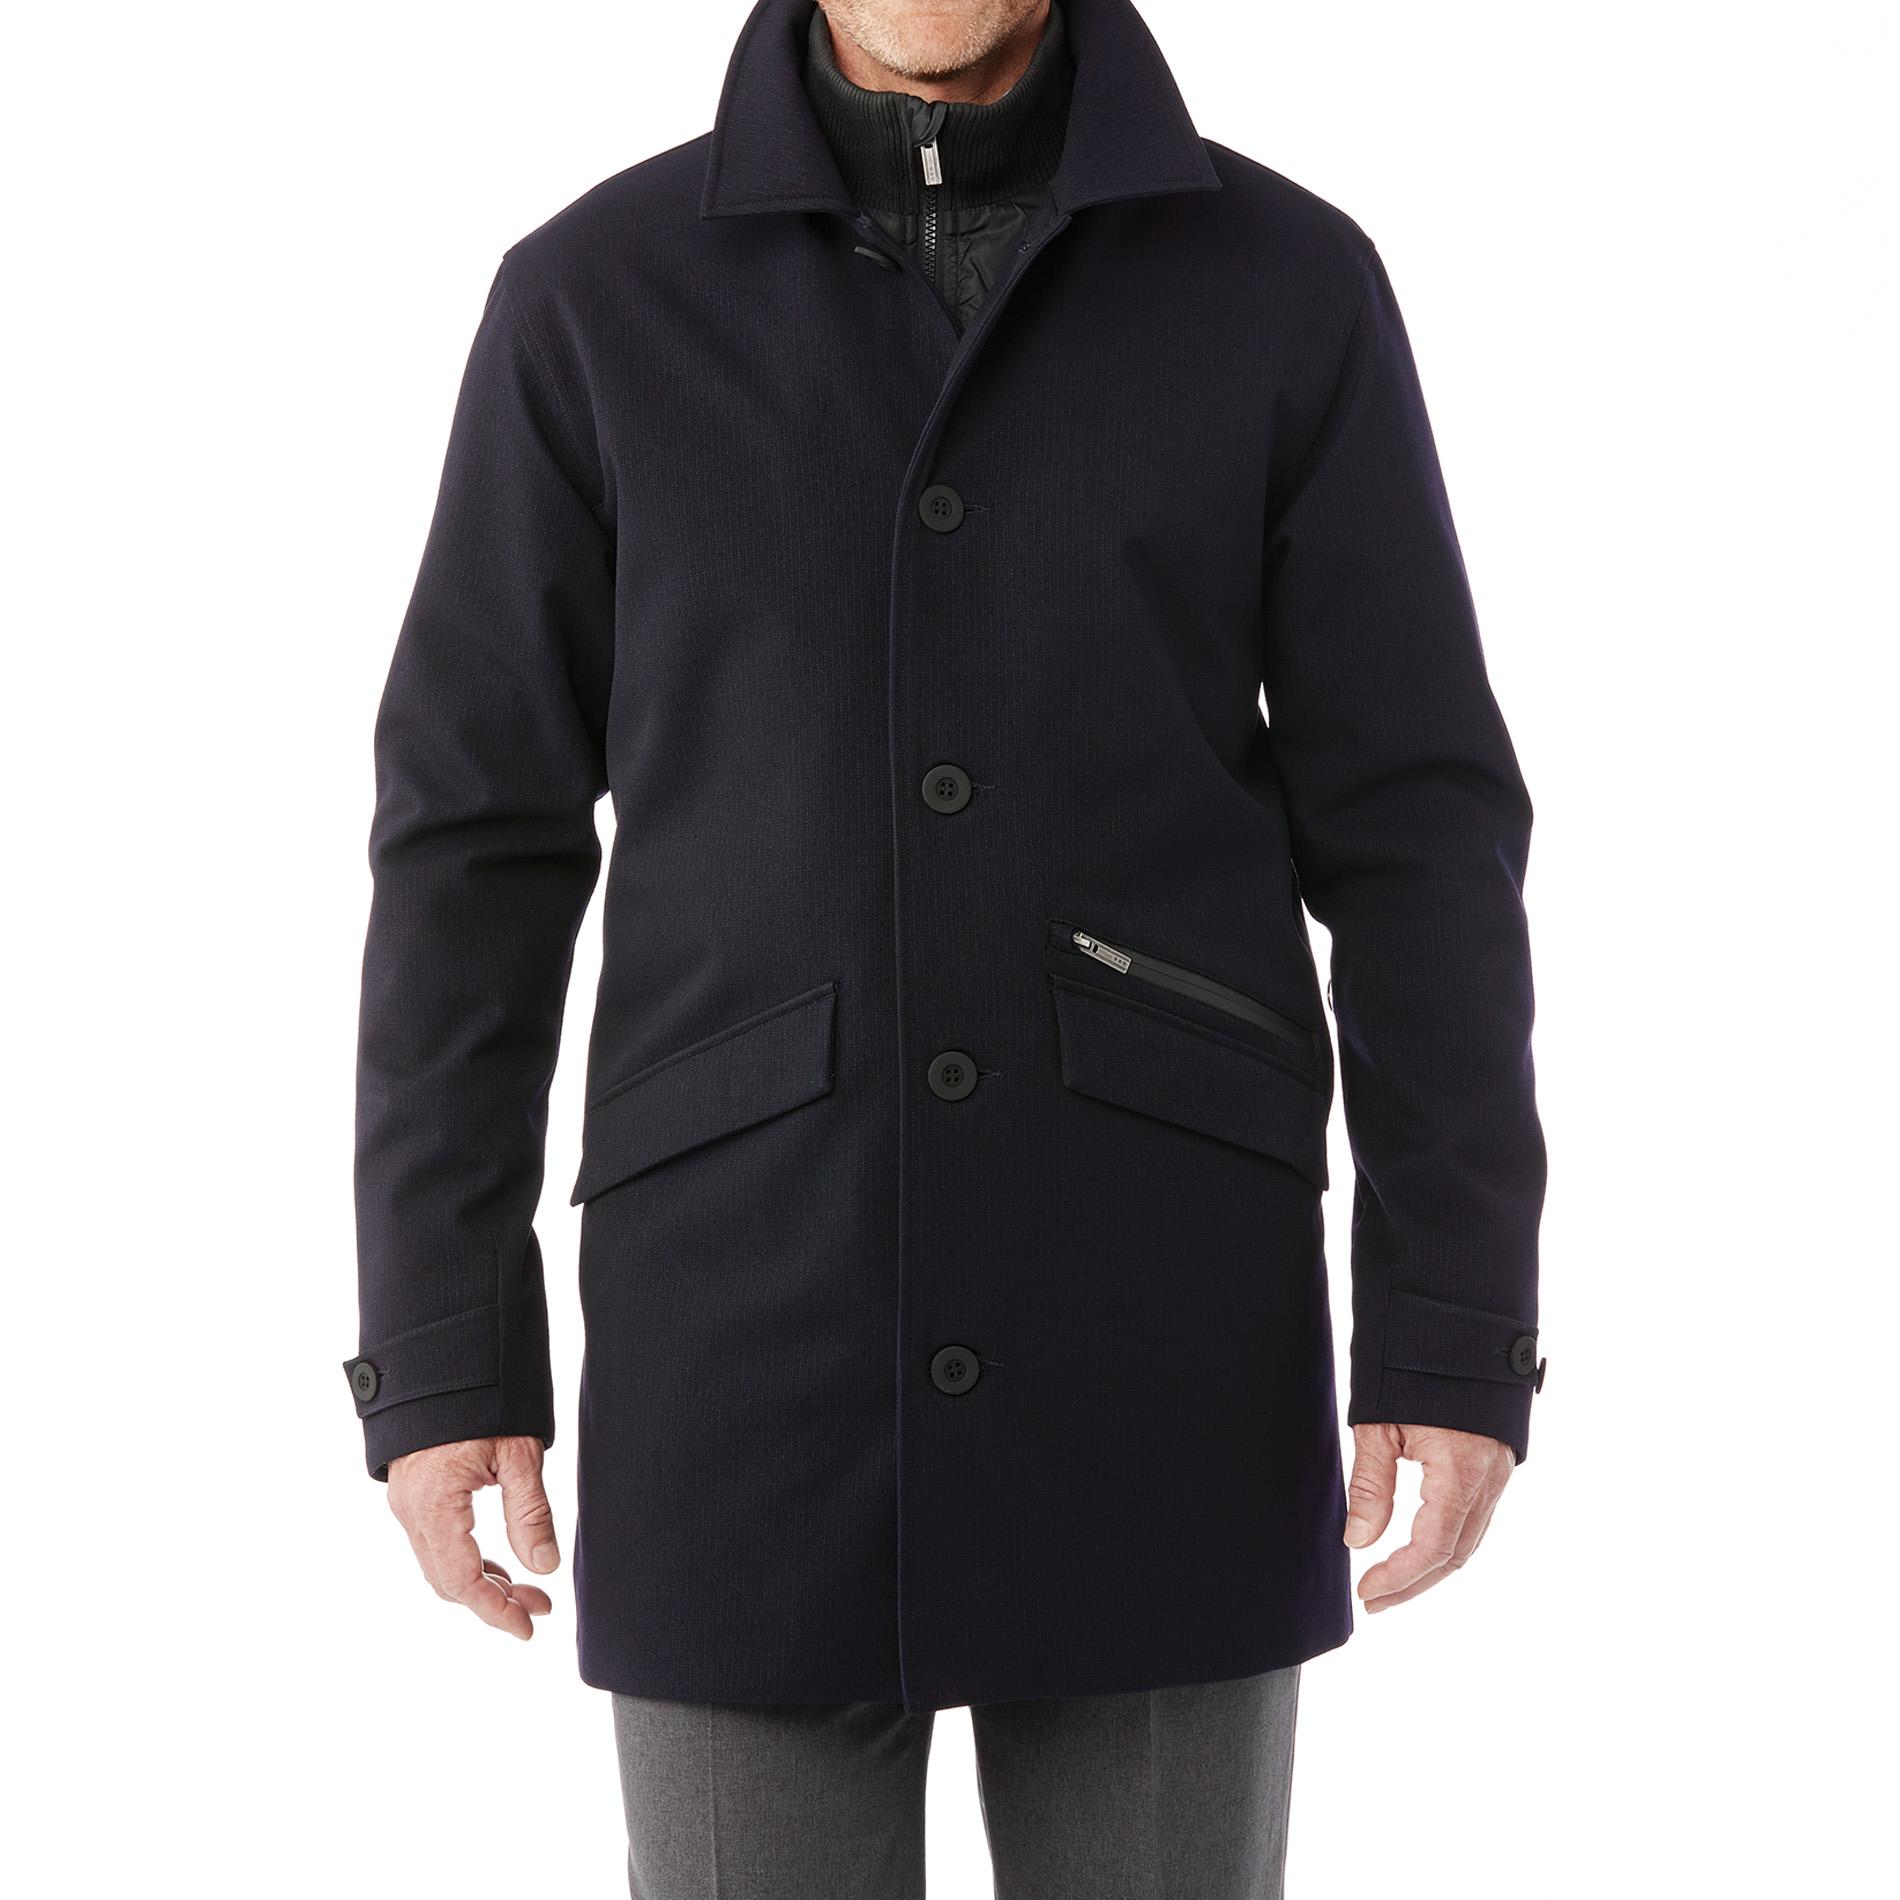 Elevate TM19703 - Men's RIVINGTON Insulated Jacket